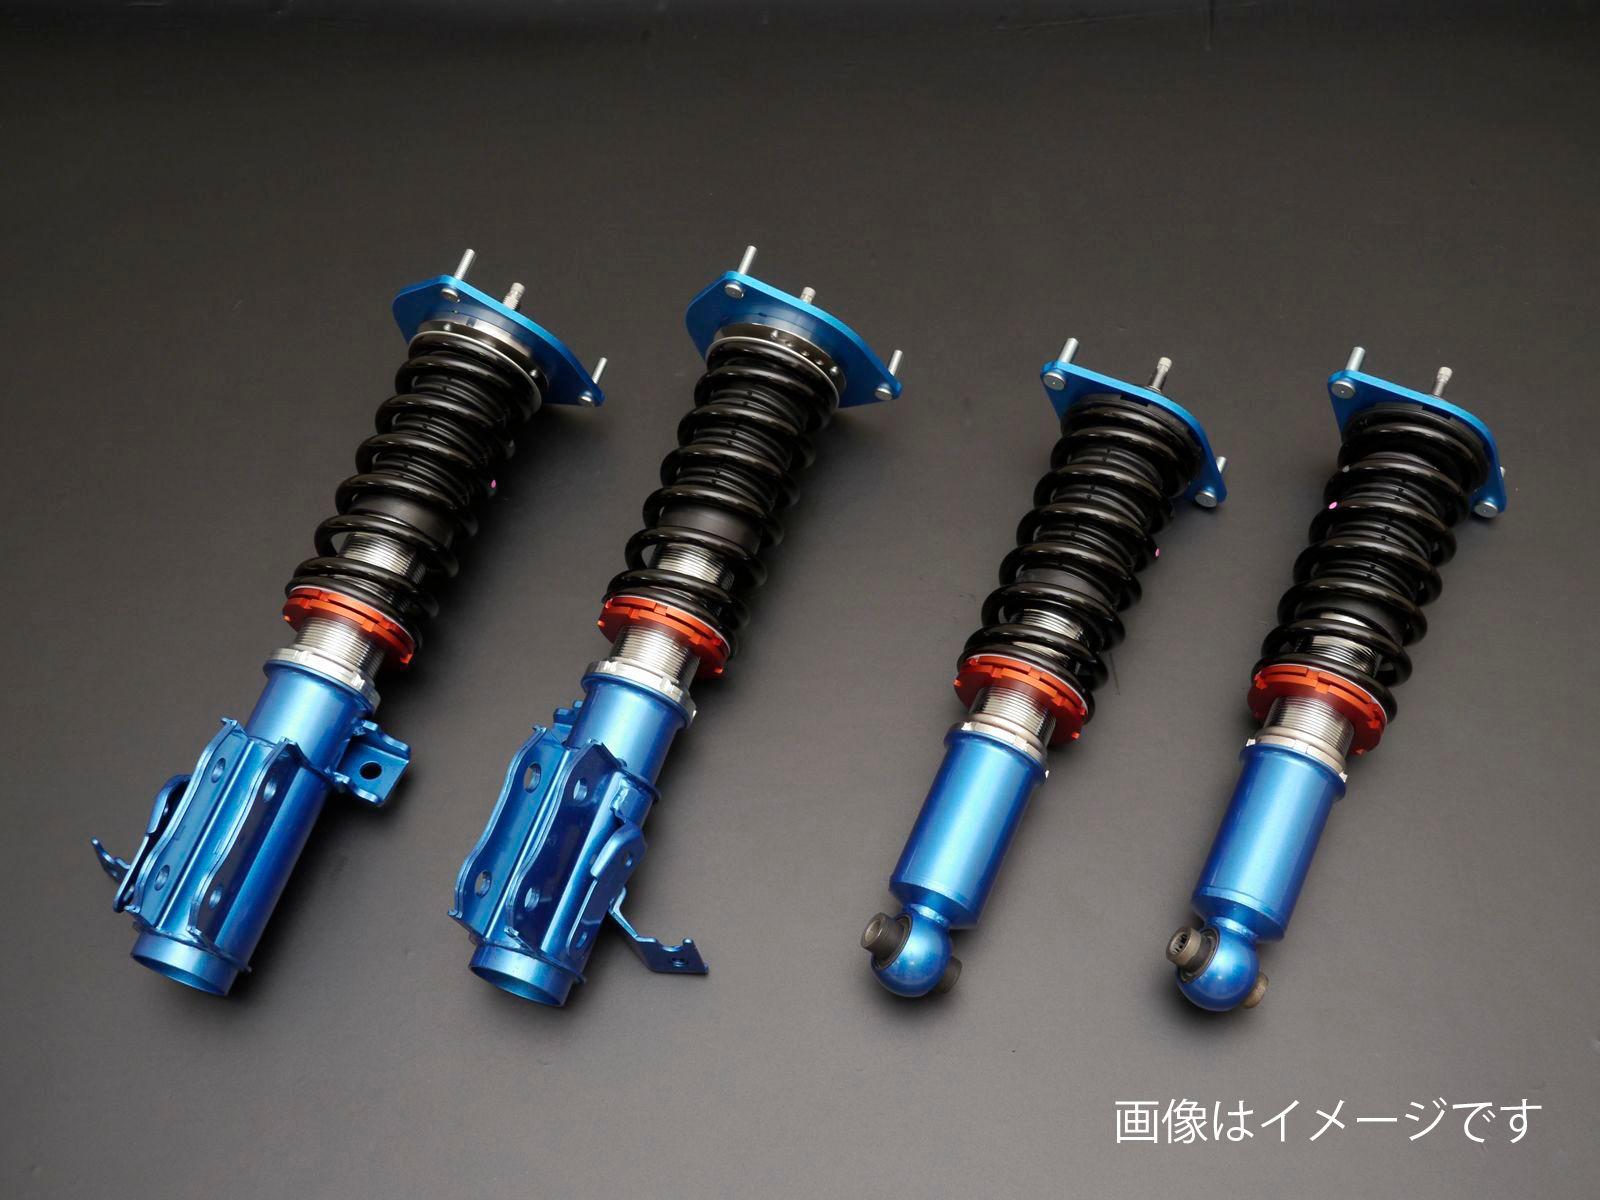 CUSCO(クスコ) 車高調キット street ZERO A 日産 スカイライン GT-R BNR34 1999.1-2002.8 商品番号:282 61N CN